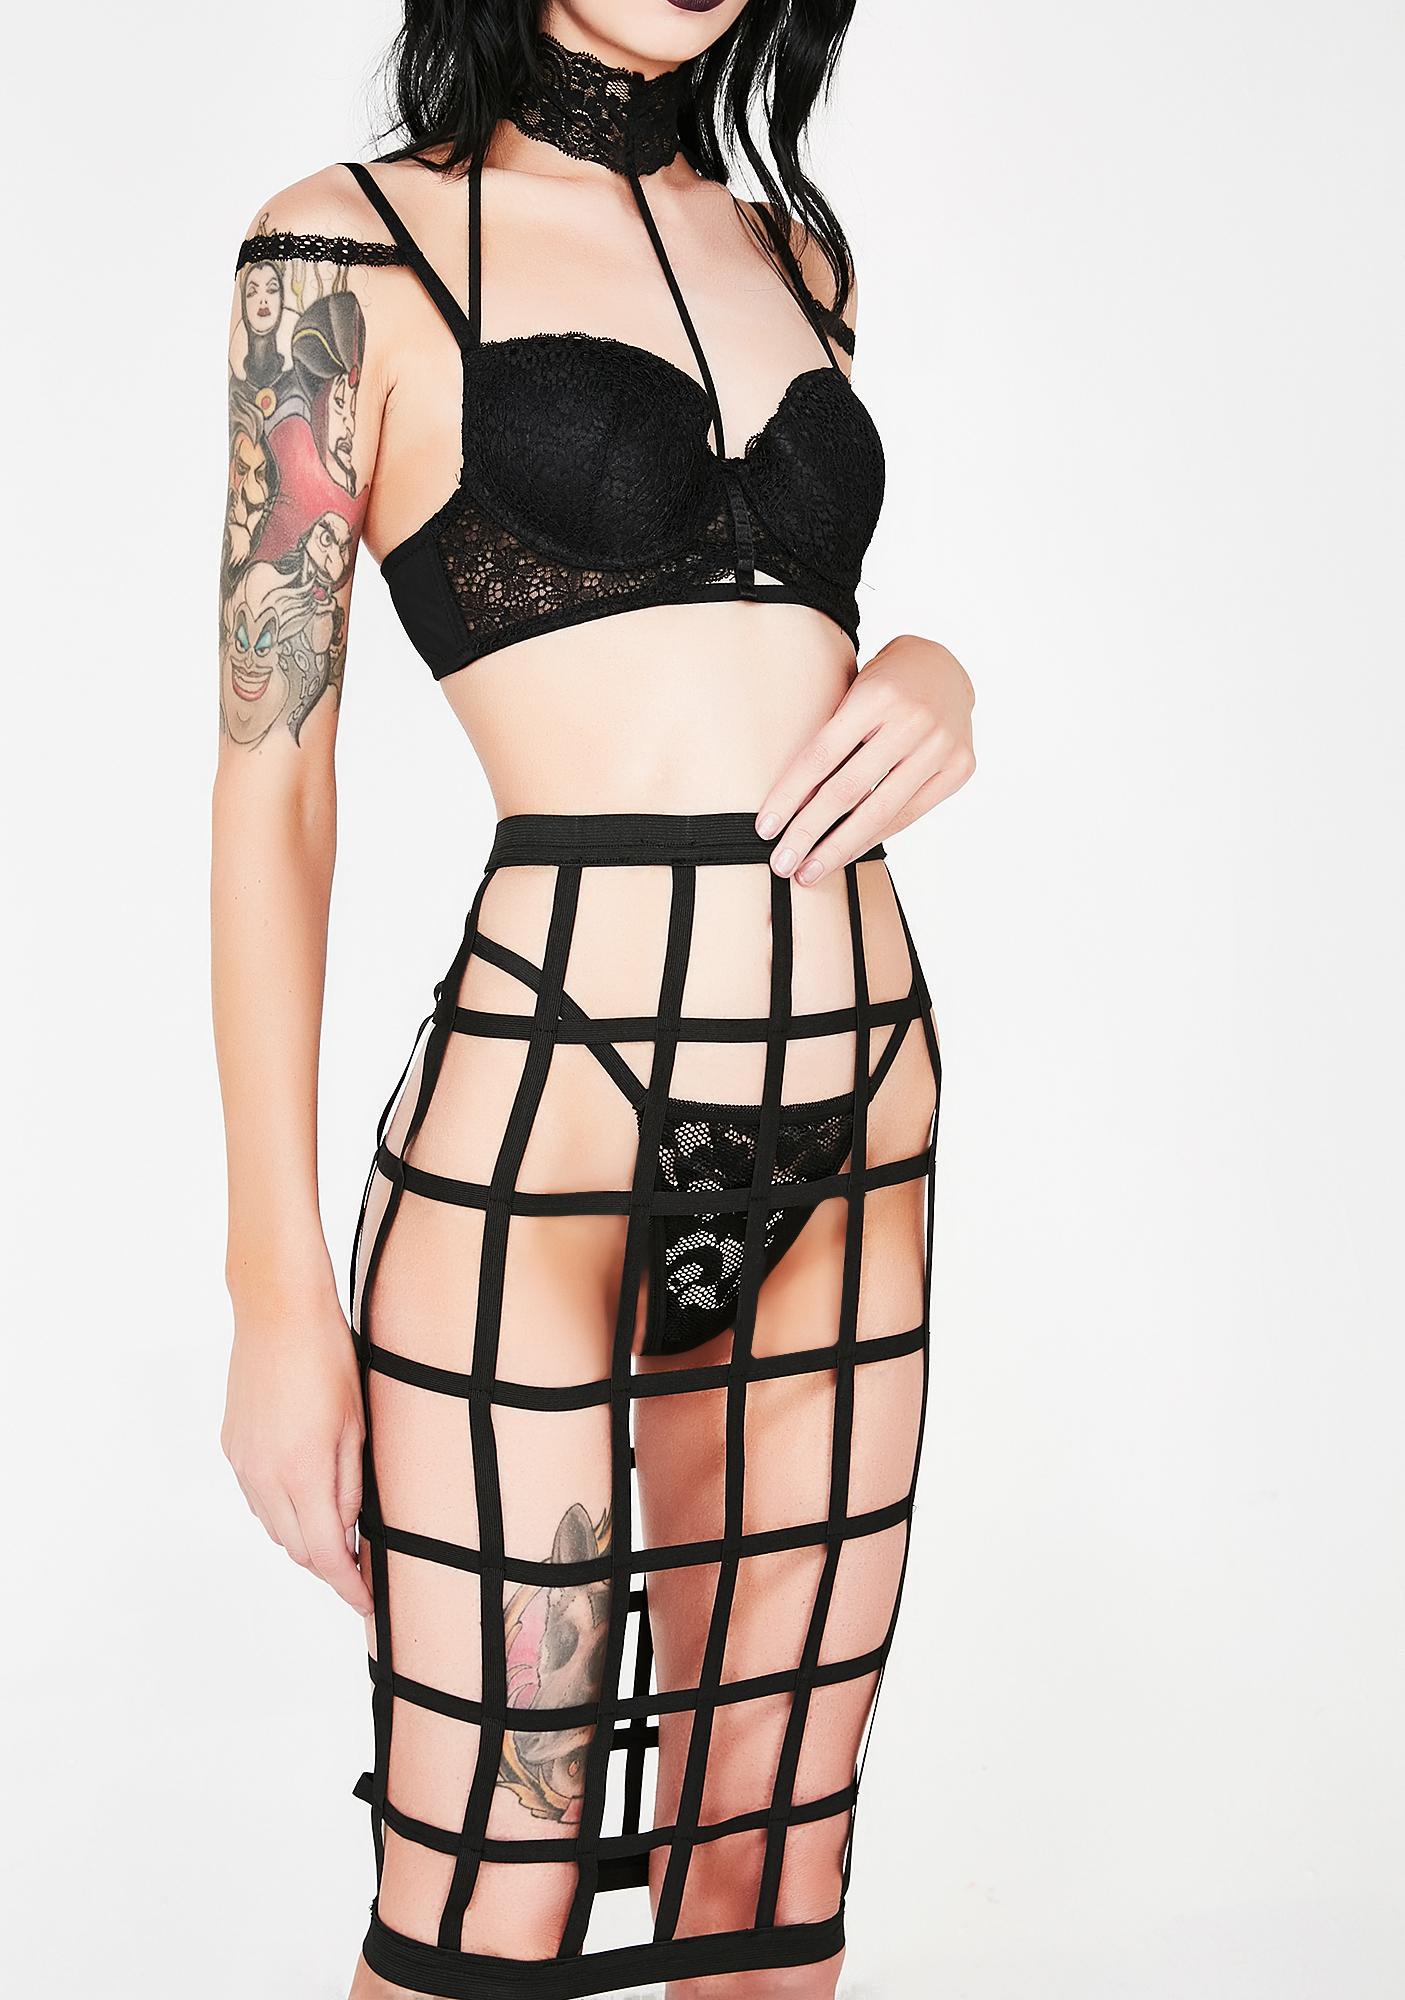 Impending Doom Cage Skirt Set